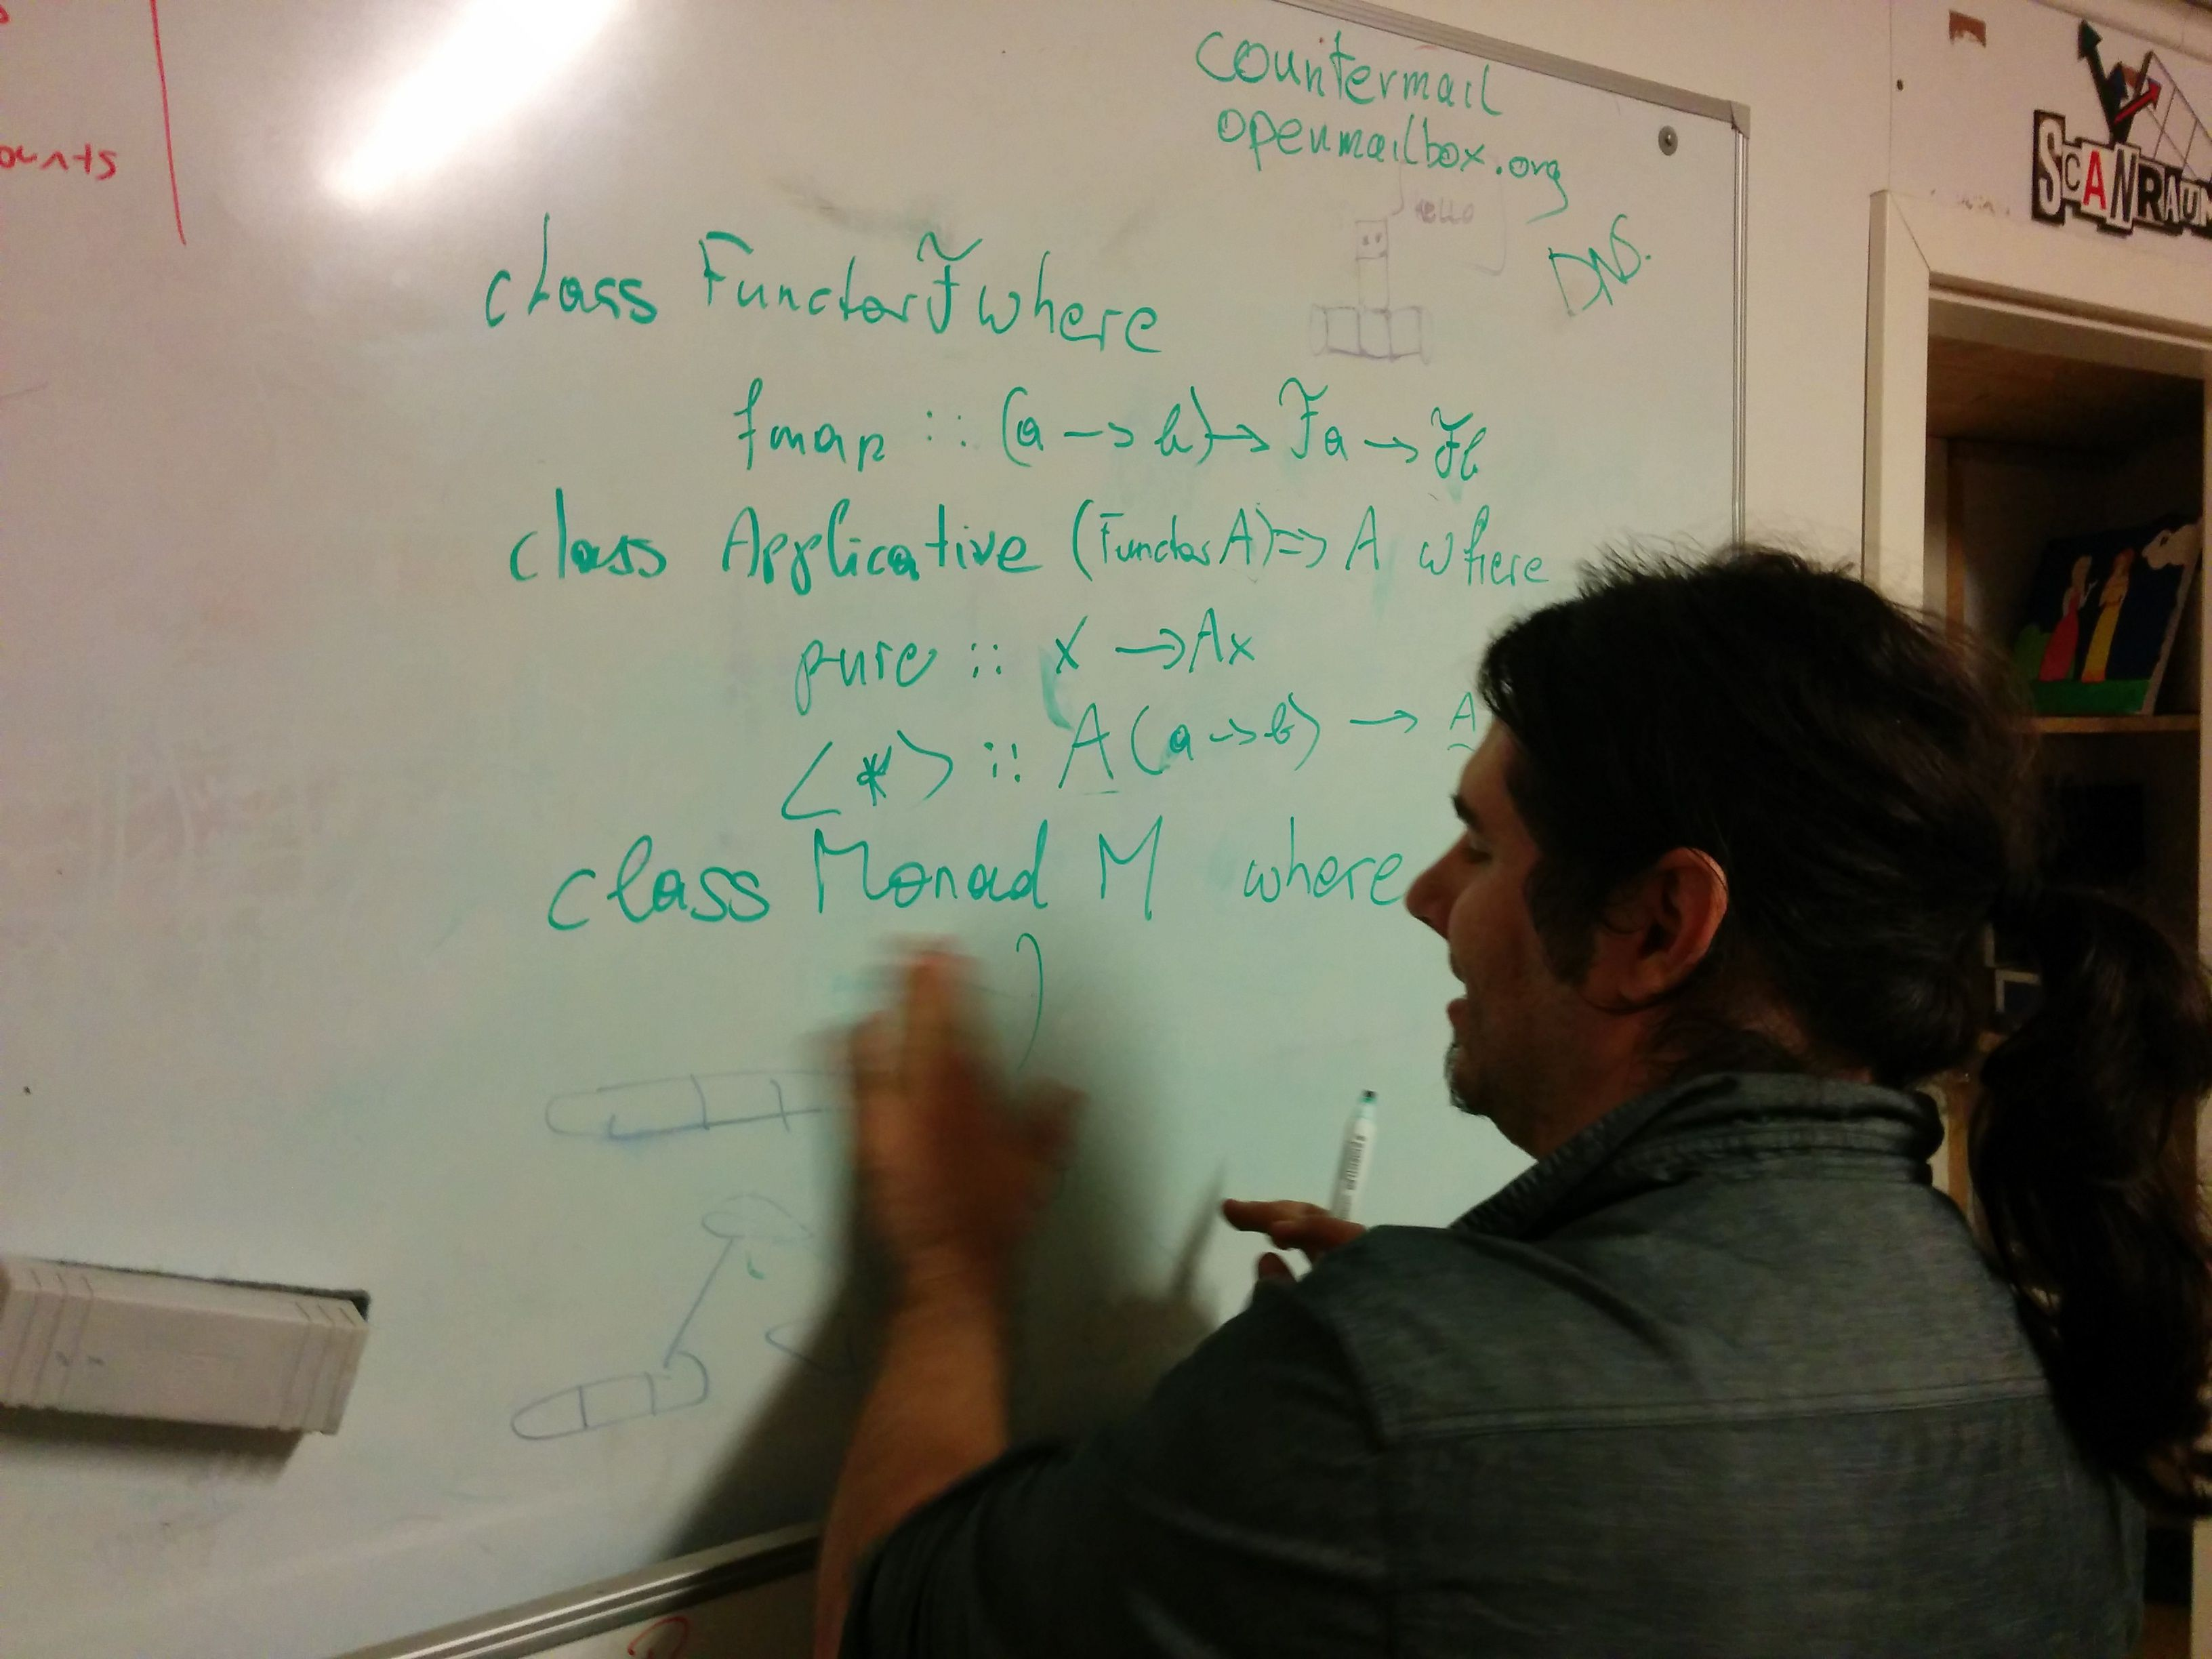 Lambdaheads - Functional Programming Vienna